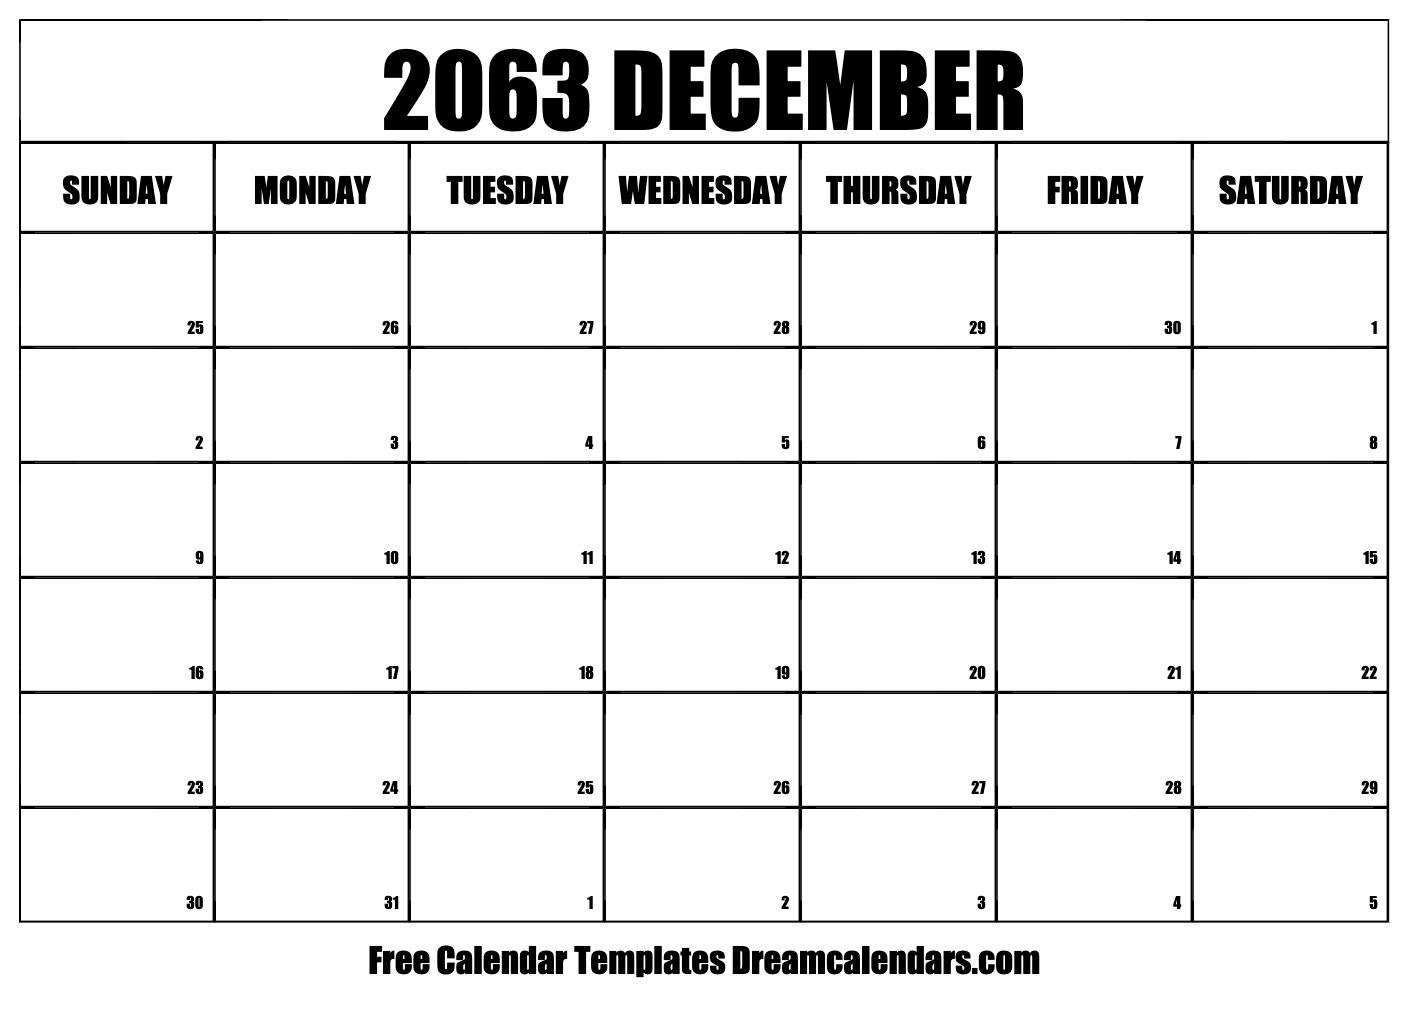 December 2063 Calendar | Free Blank Printable Templates